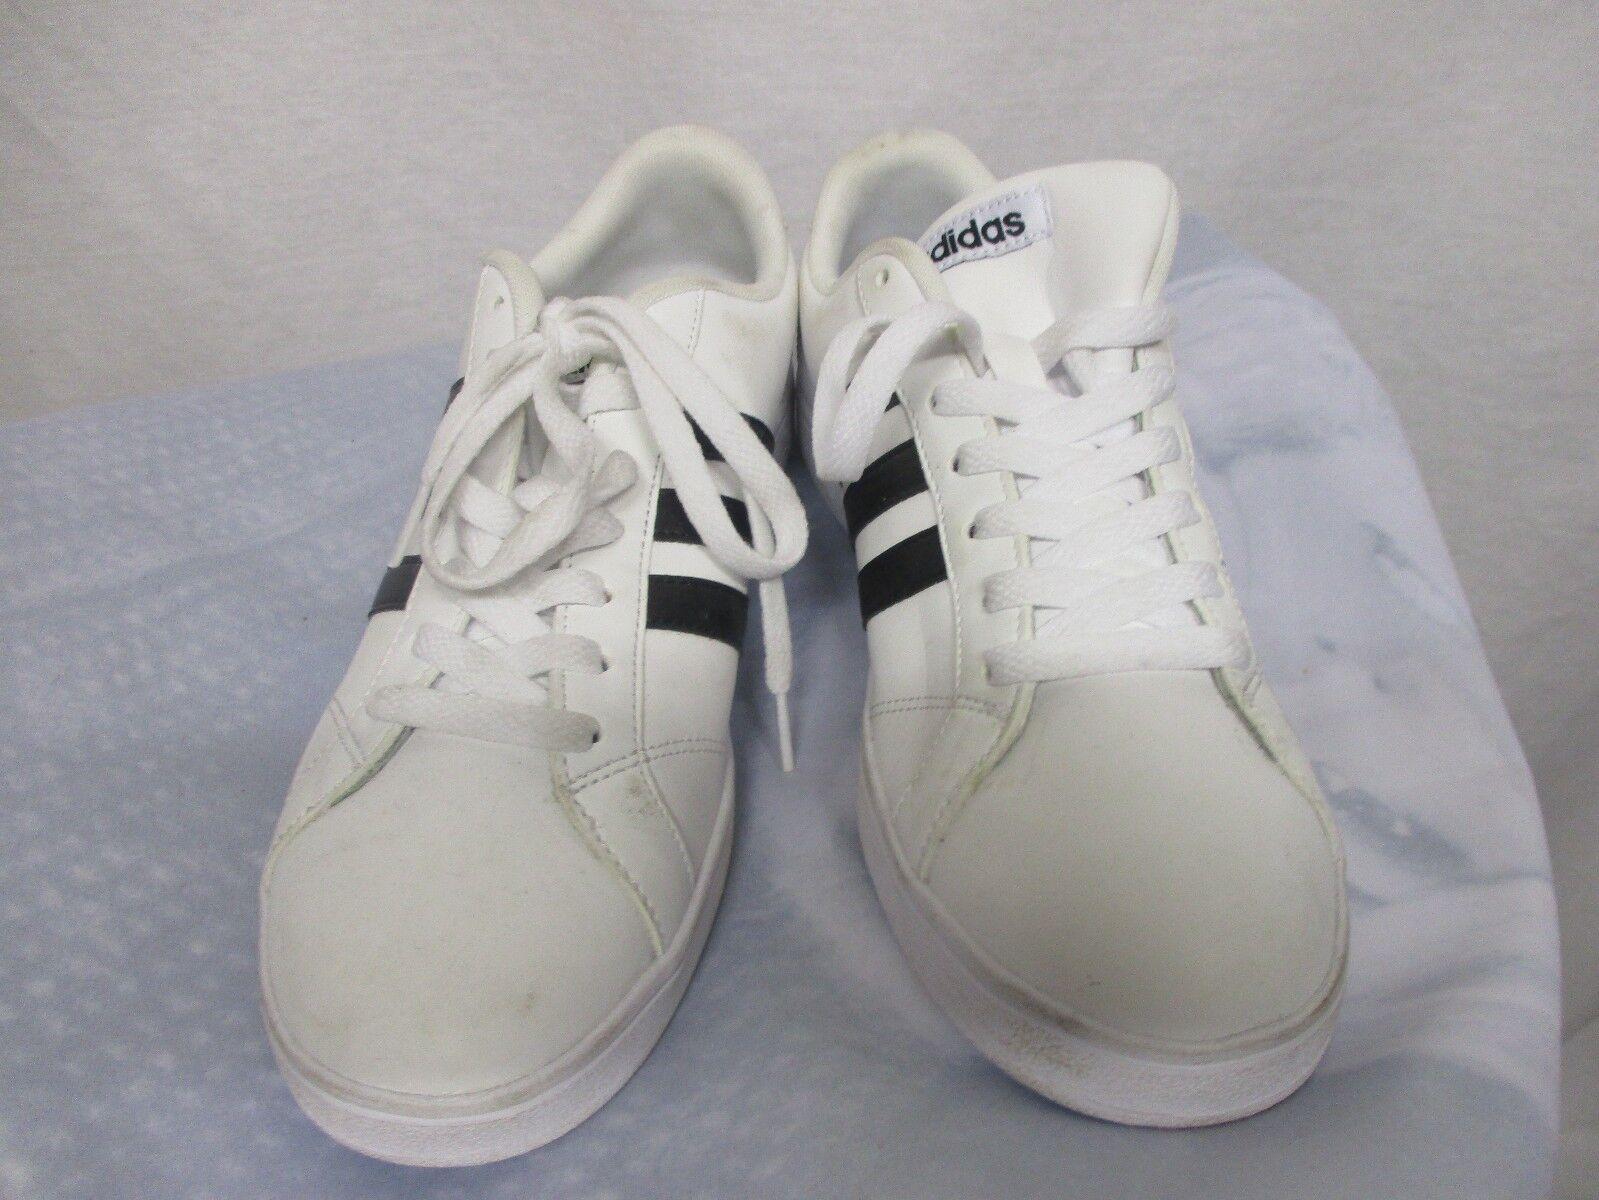 Adidas NEO Women's Baseline W Fashion Sneaker Comfort Footbed White/Black Sz 10